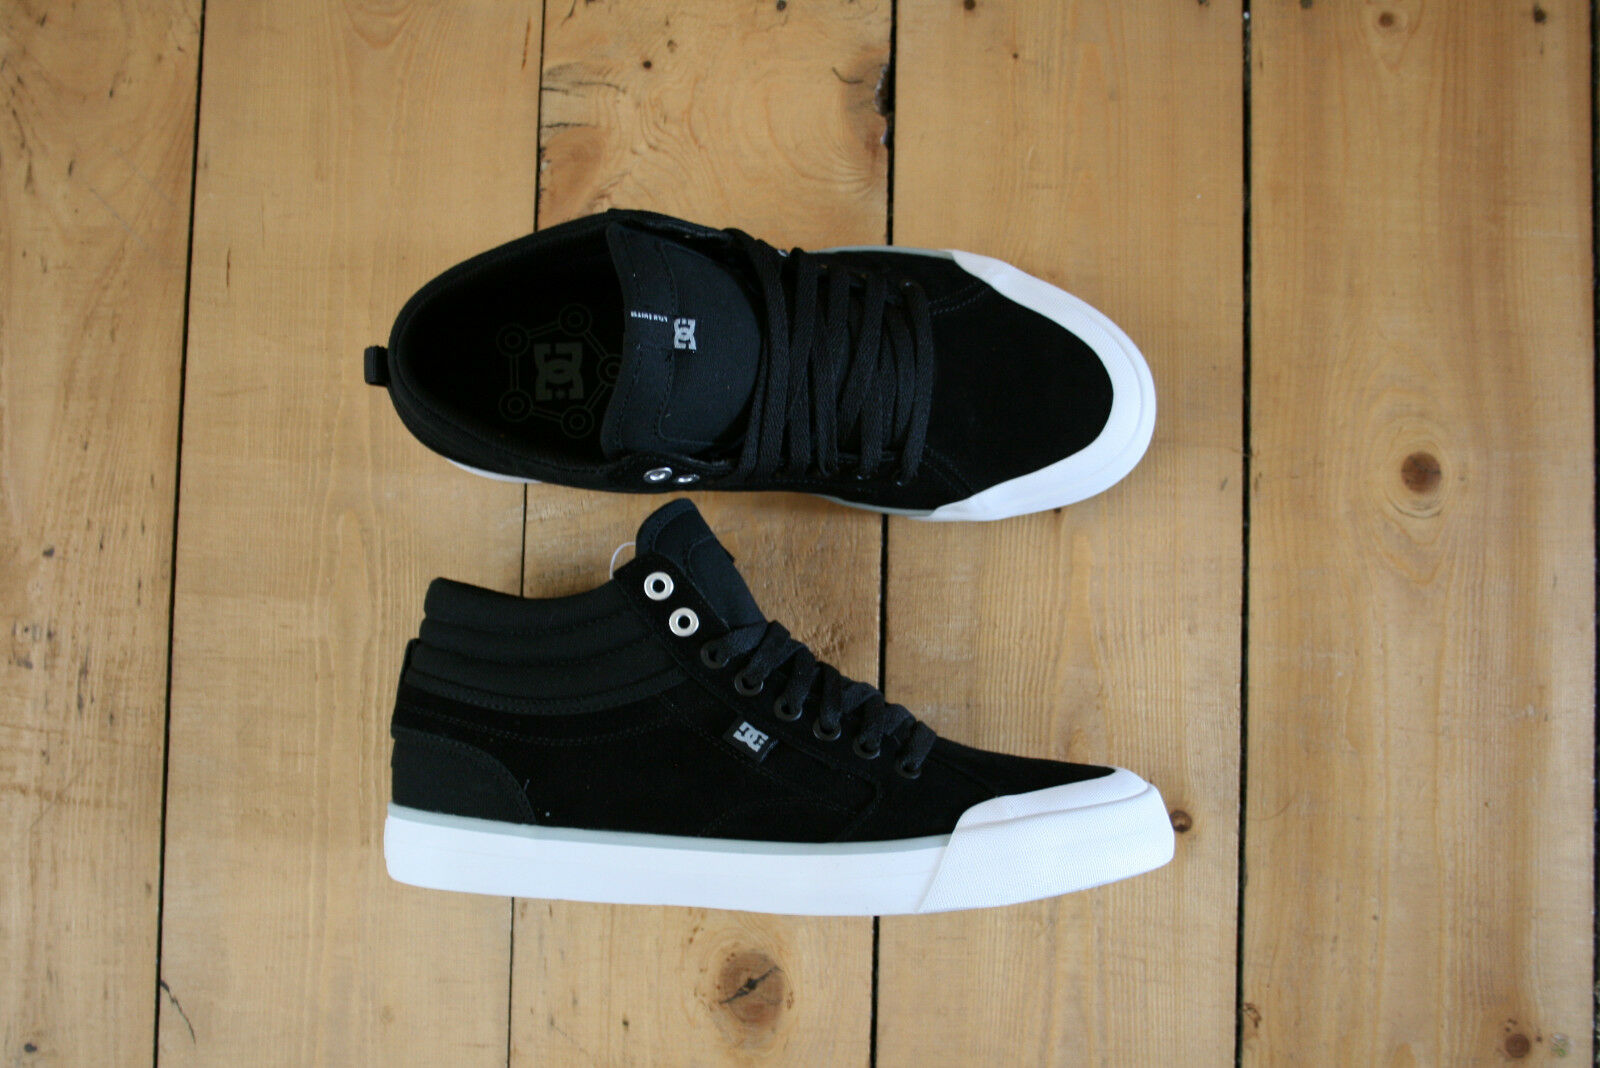 DC Schuhe Evan Smith S HI